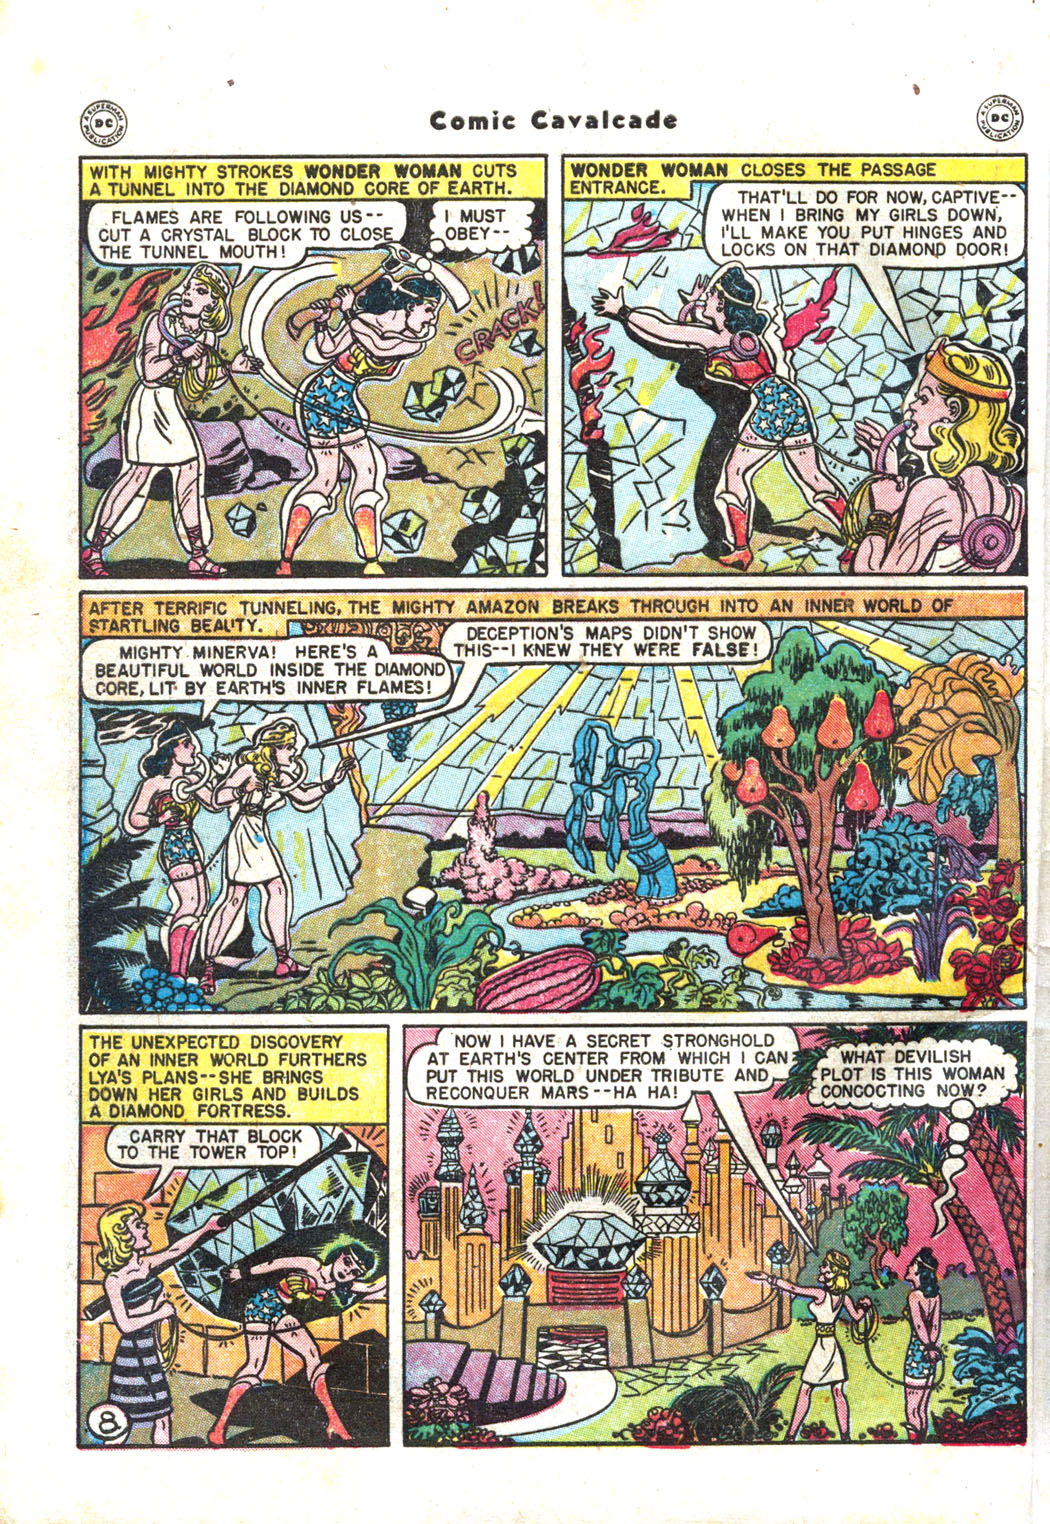 Comic Cavalcade issue 26 - Page 10